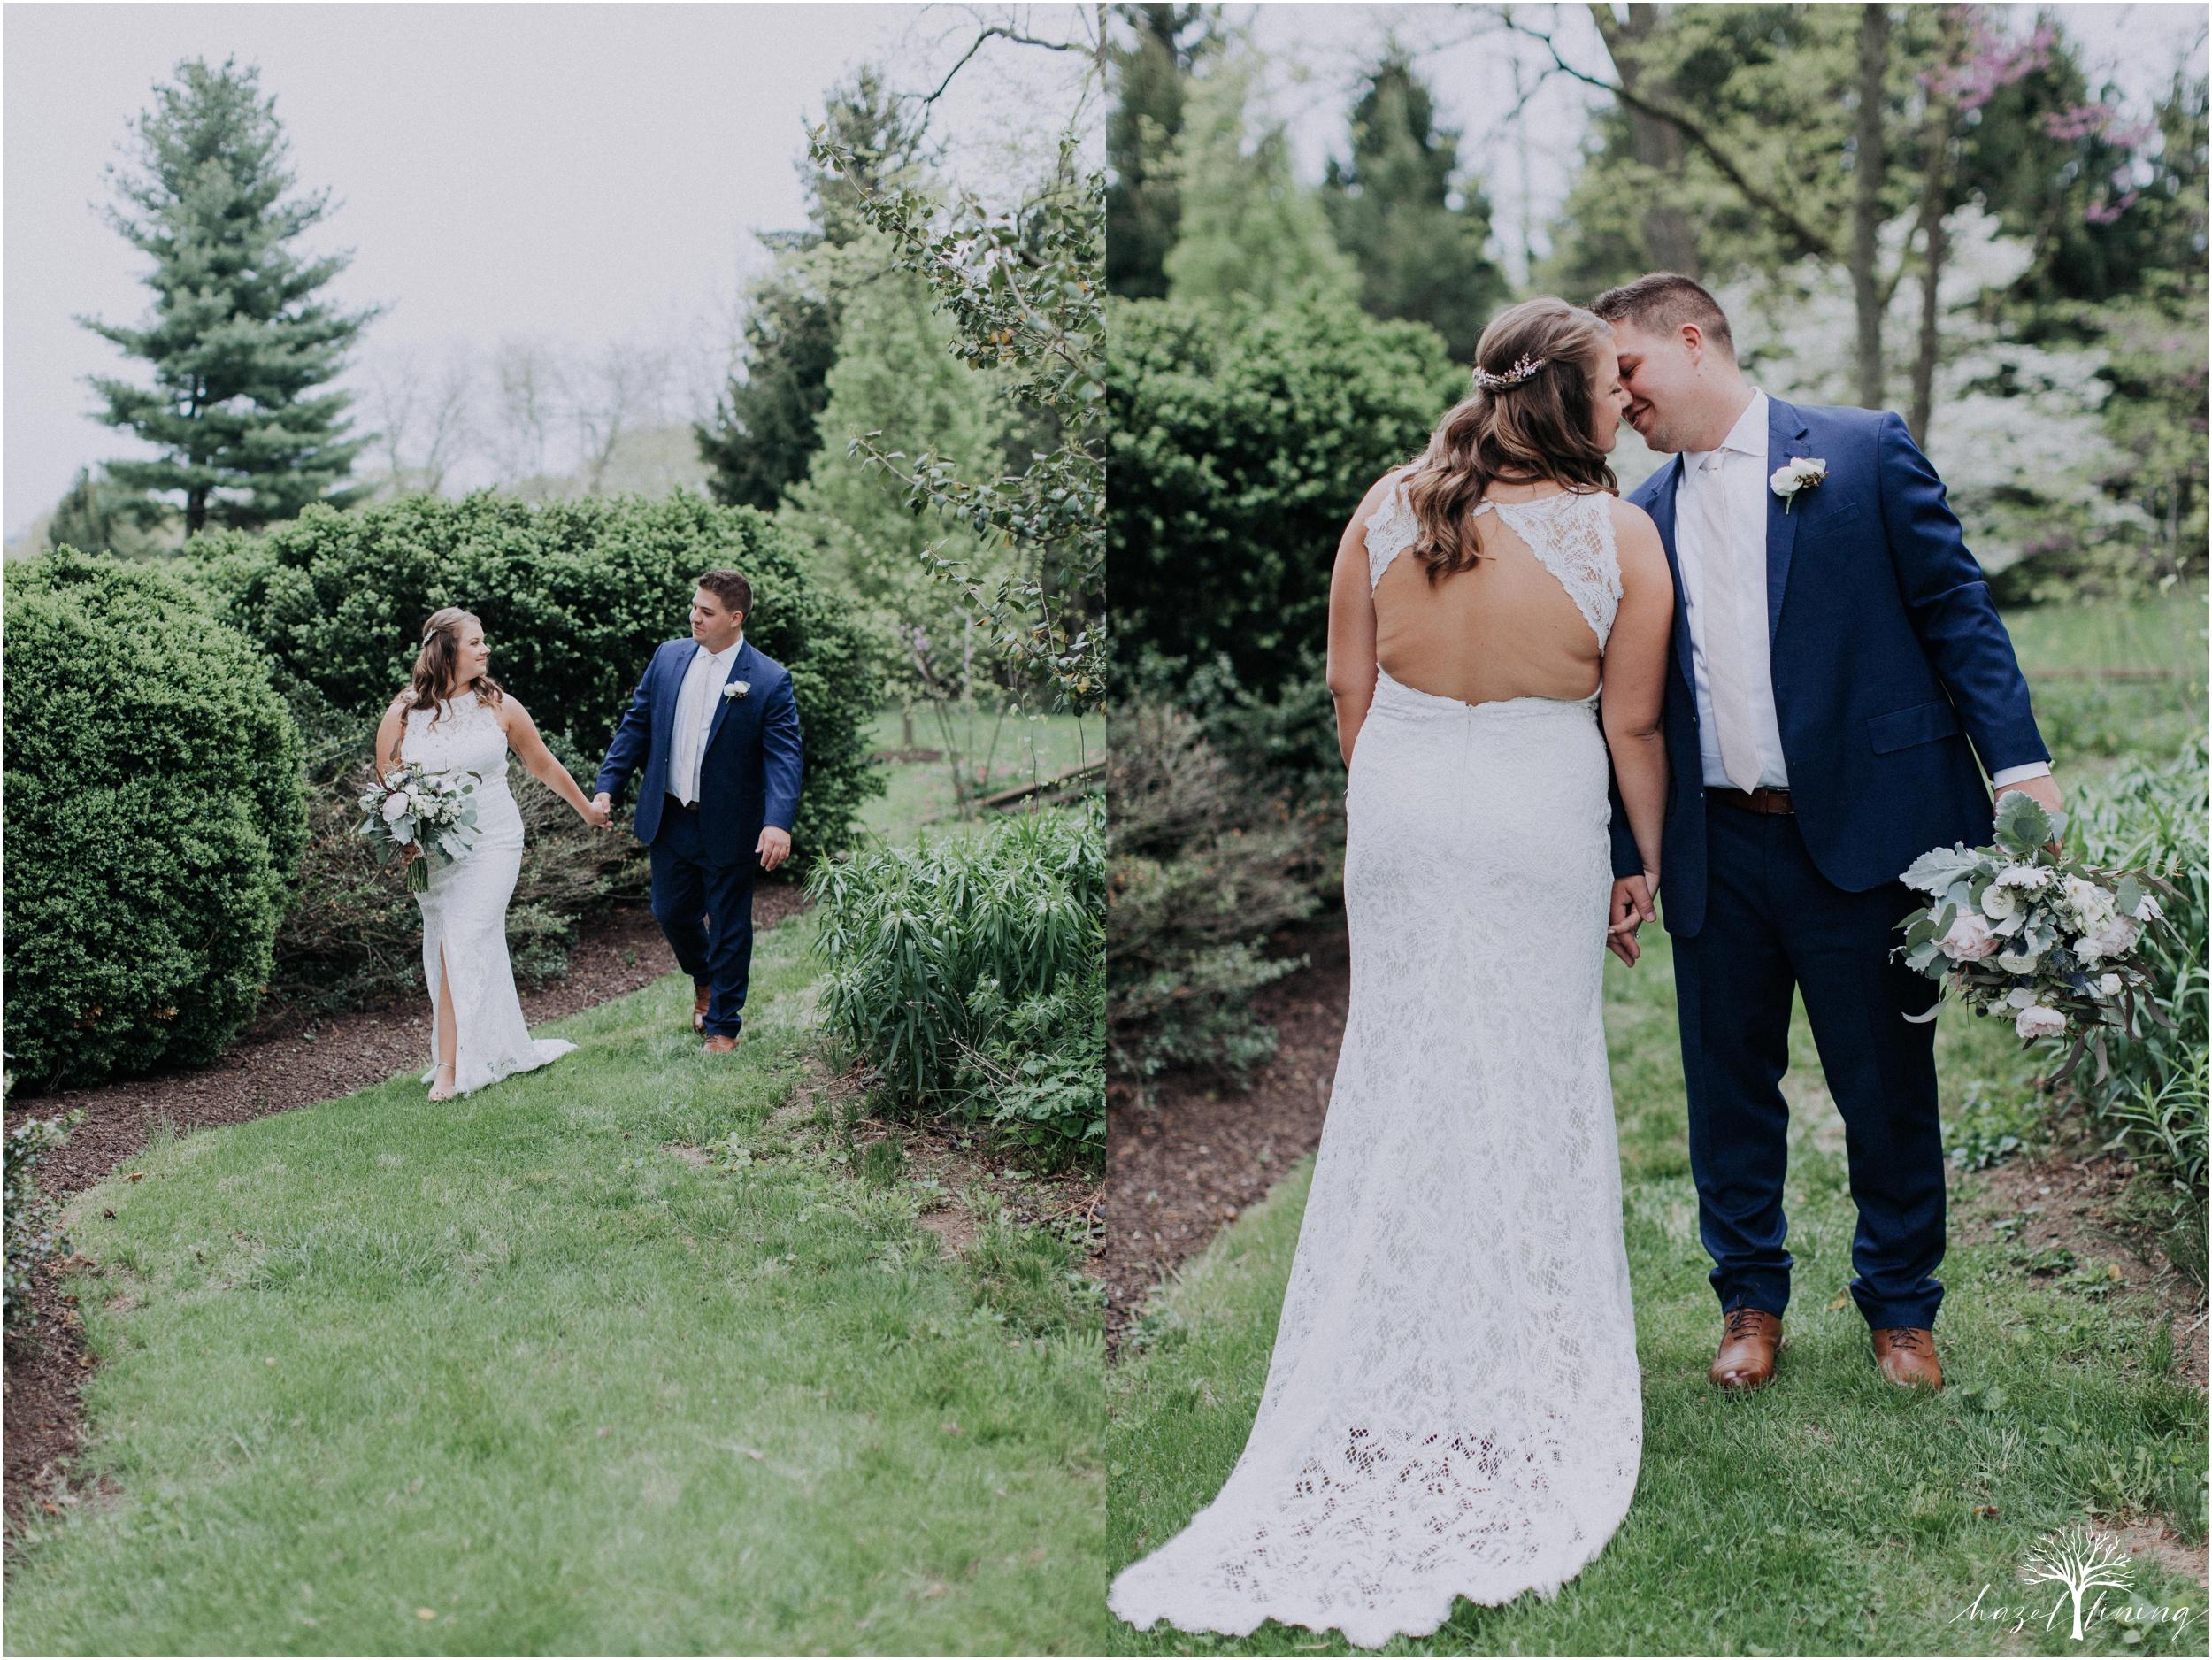 hazel-lining-travel-wedding-elopement-photography-abby-skyler-hunt-the-willis-house-york-pennsylvania-outdoor-estate-wedding_0034.jpg